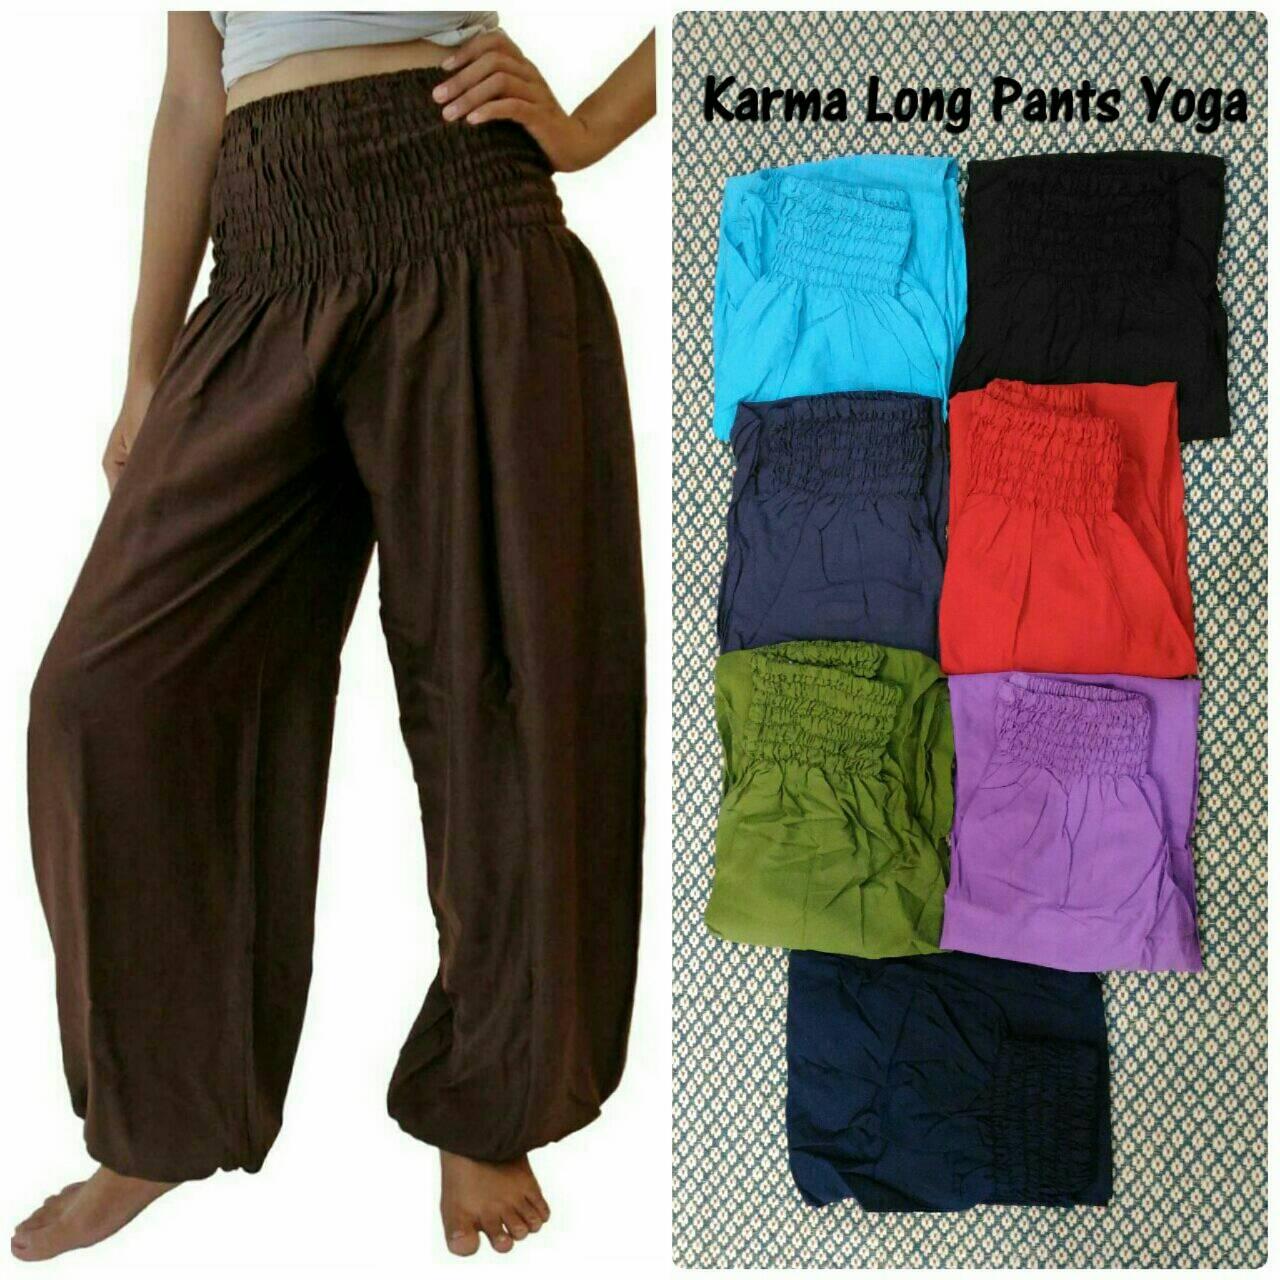 Karma Long Pant - Unique Yoga Wear Indonesia